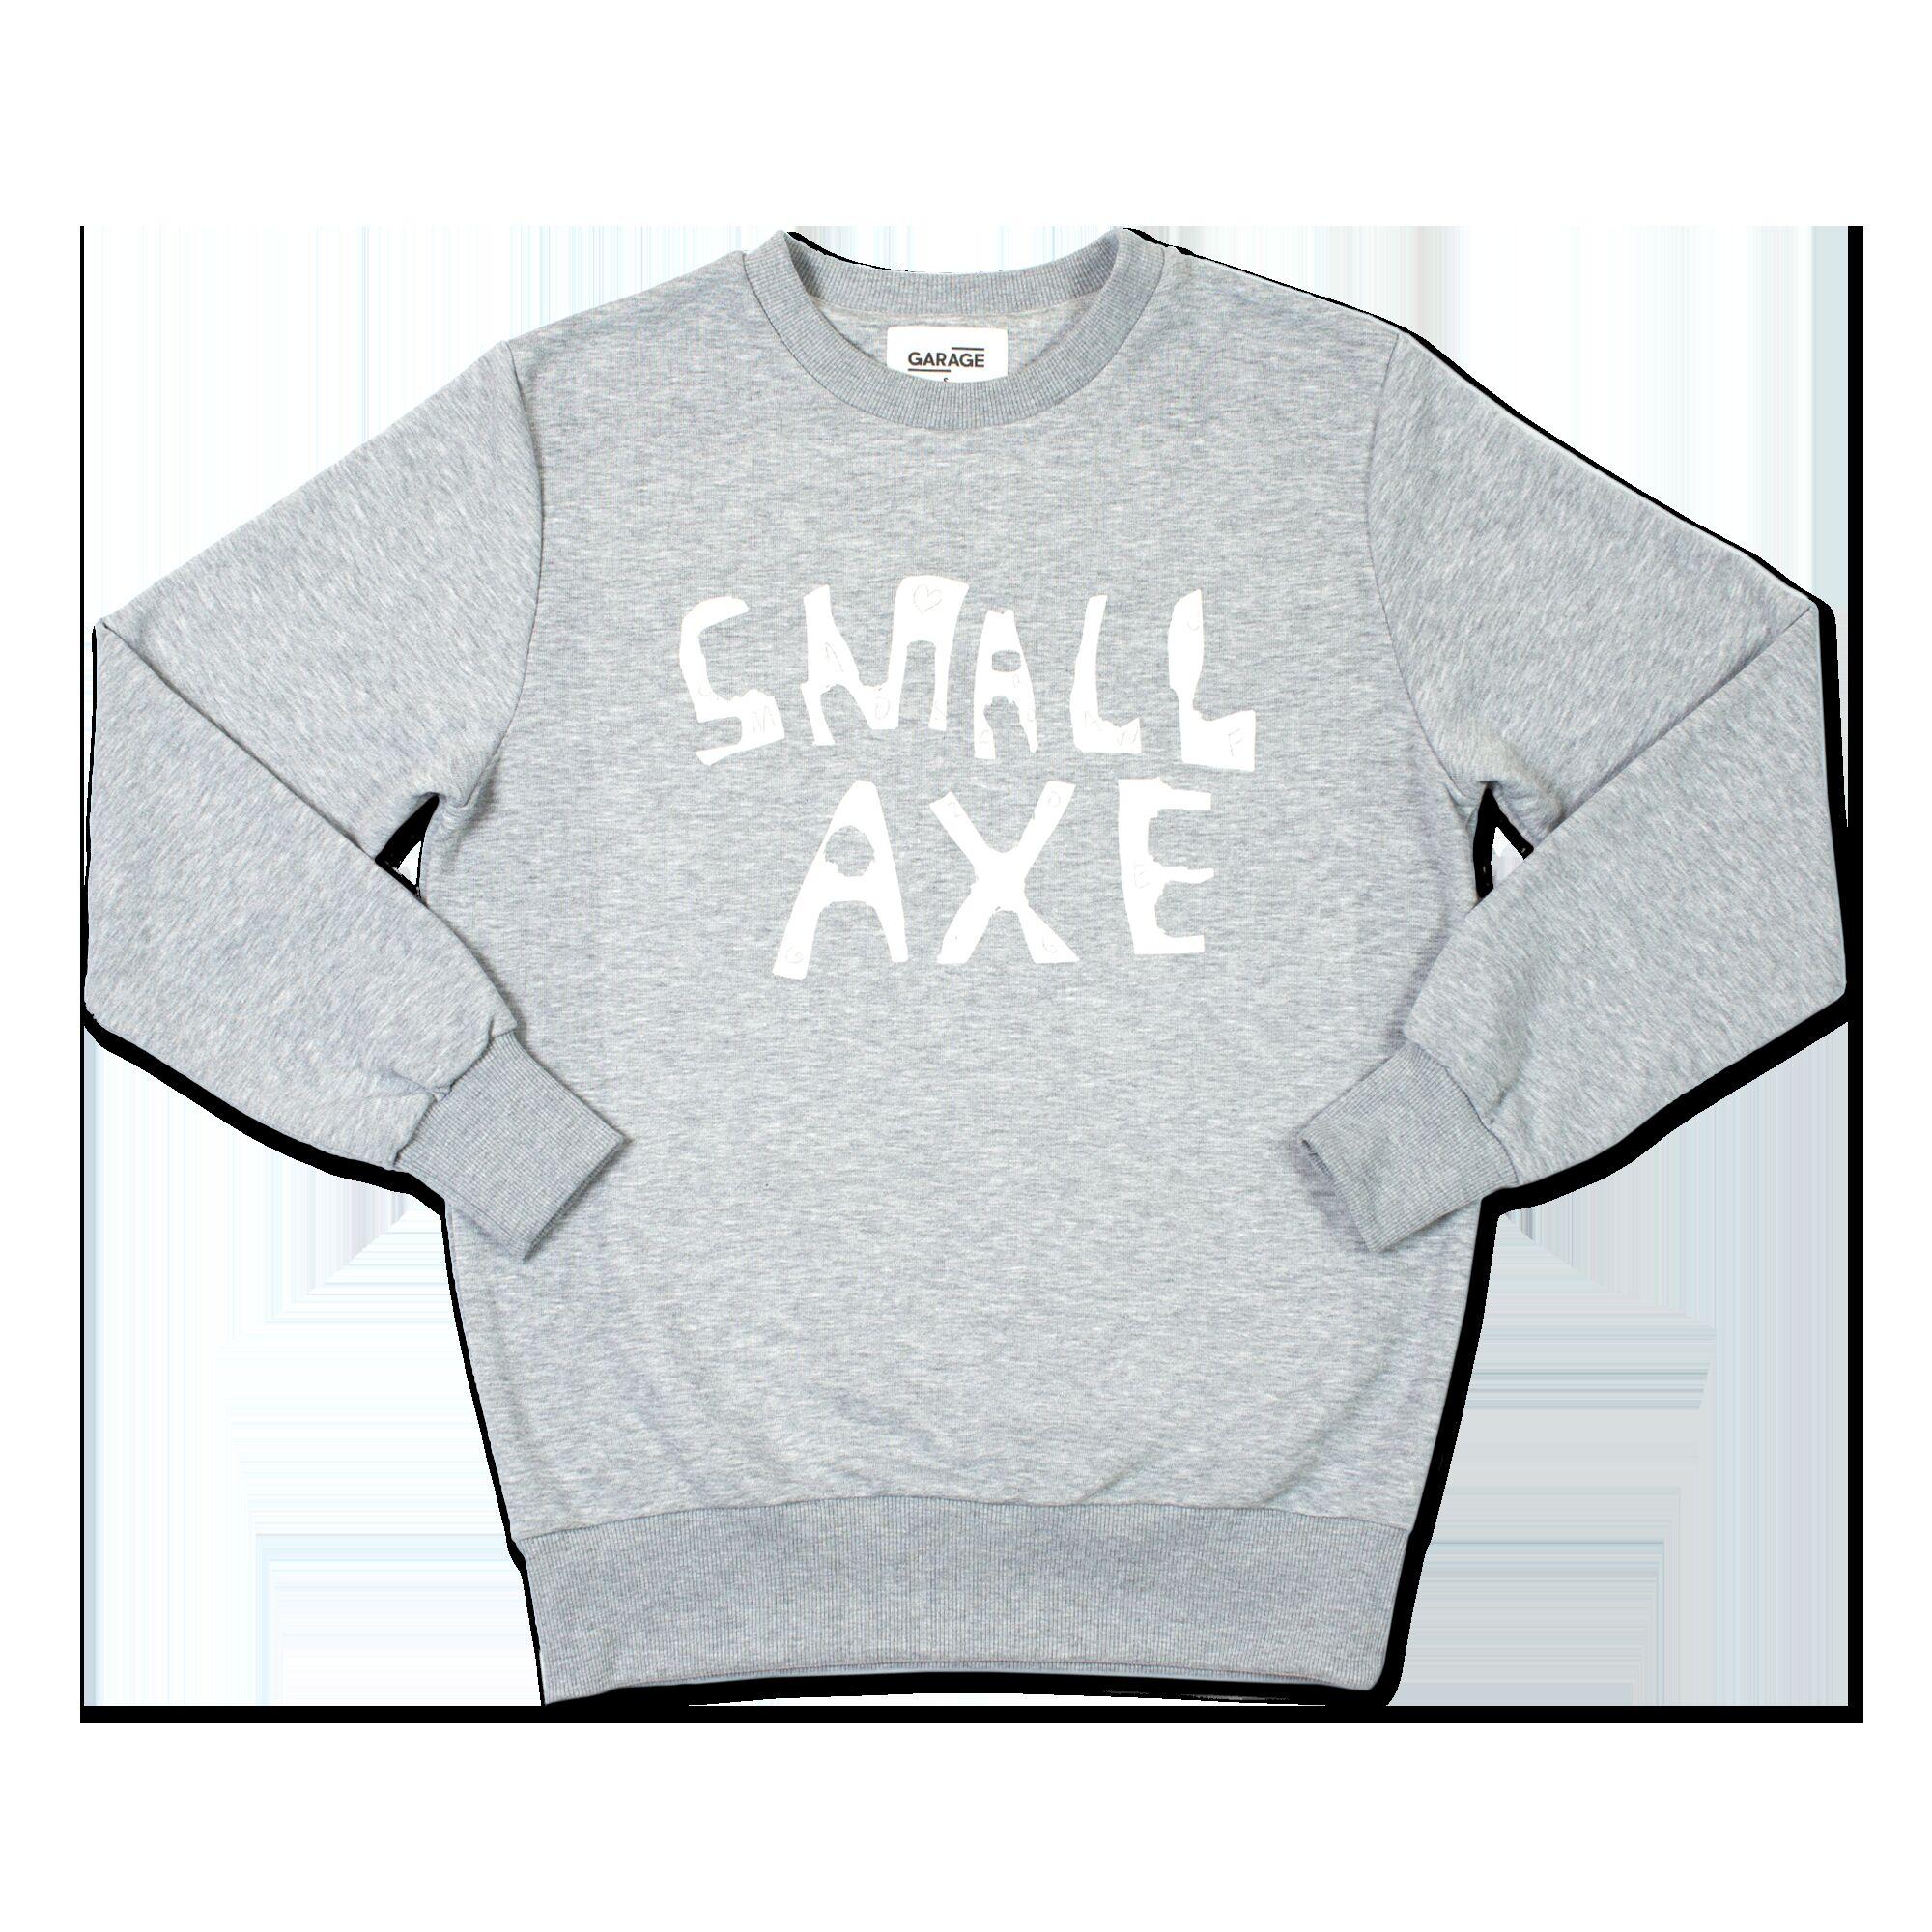 Толстовка SMALL AXE